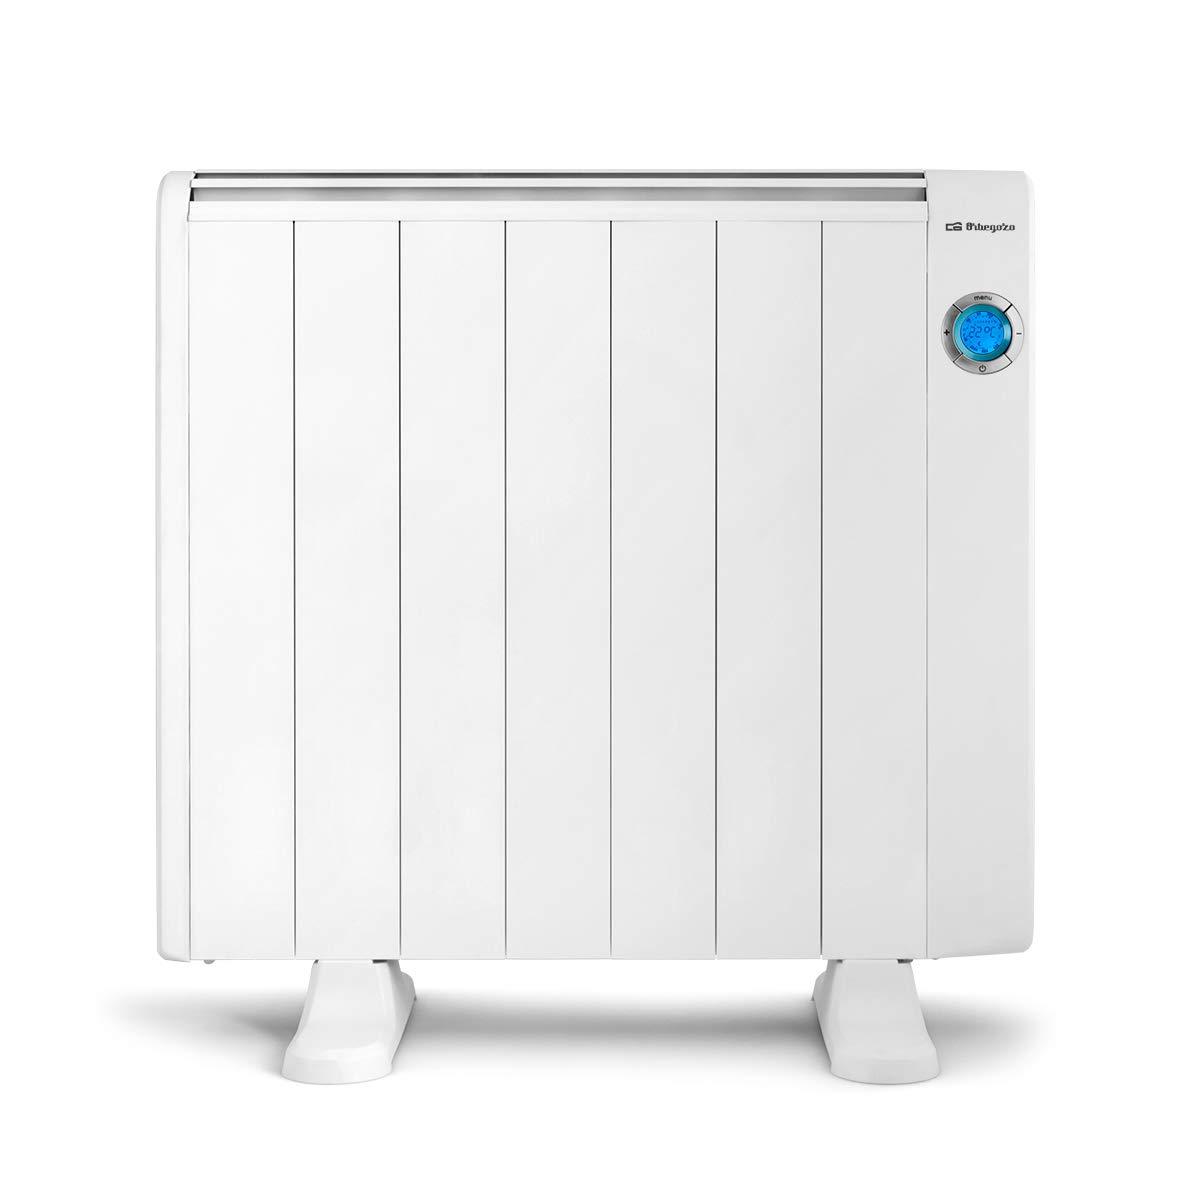 Pantalla Digital LCD Mando a Distancia Aluminio Color blanco 500 W Orbegozo RRE 510 Emisor T/érmico Bajo Consumo 3 Elementos de Calor